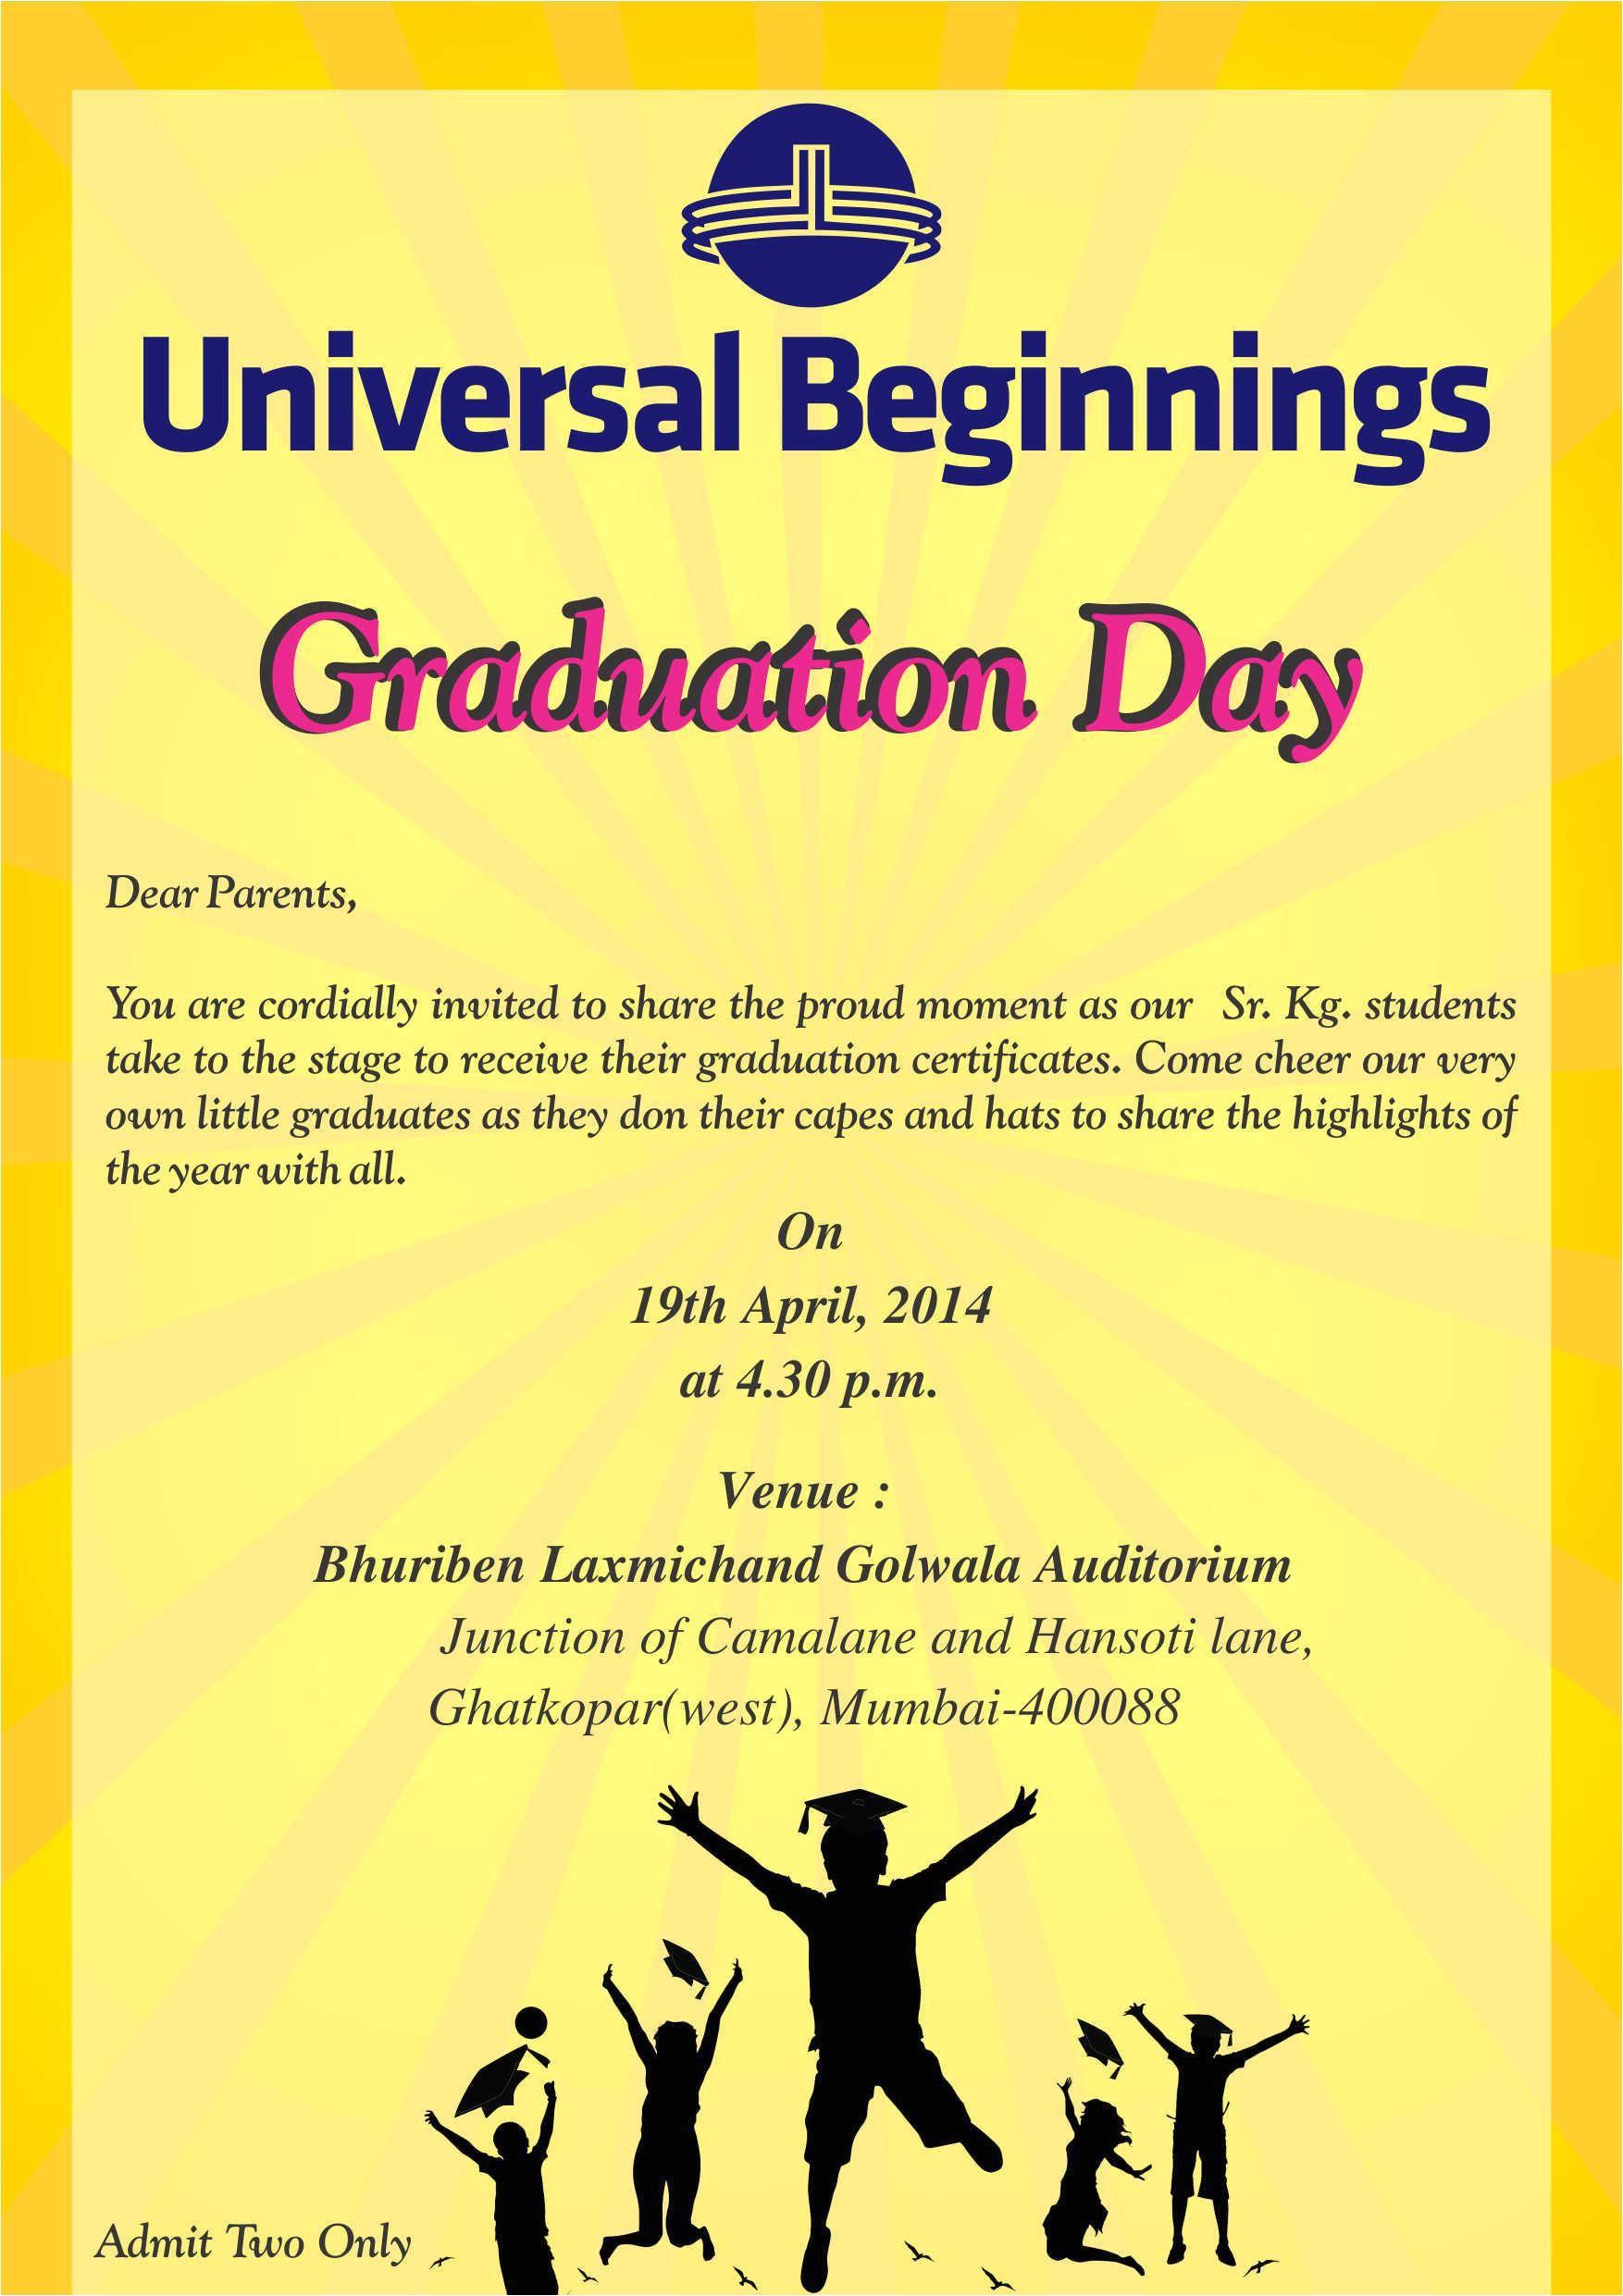 graduation ceremony invitation cards 2